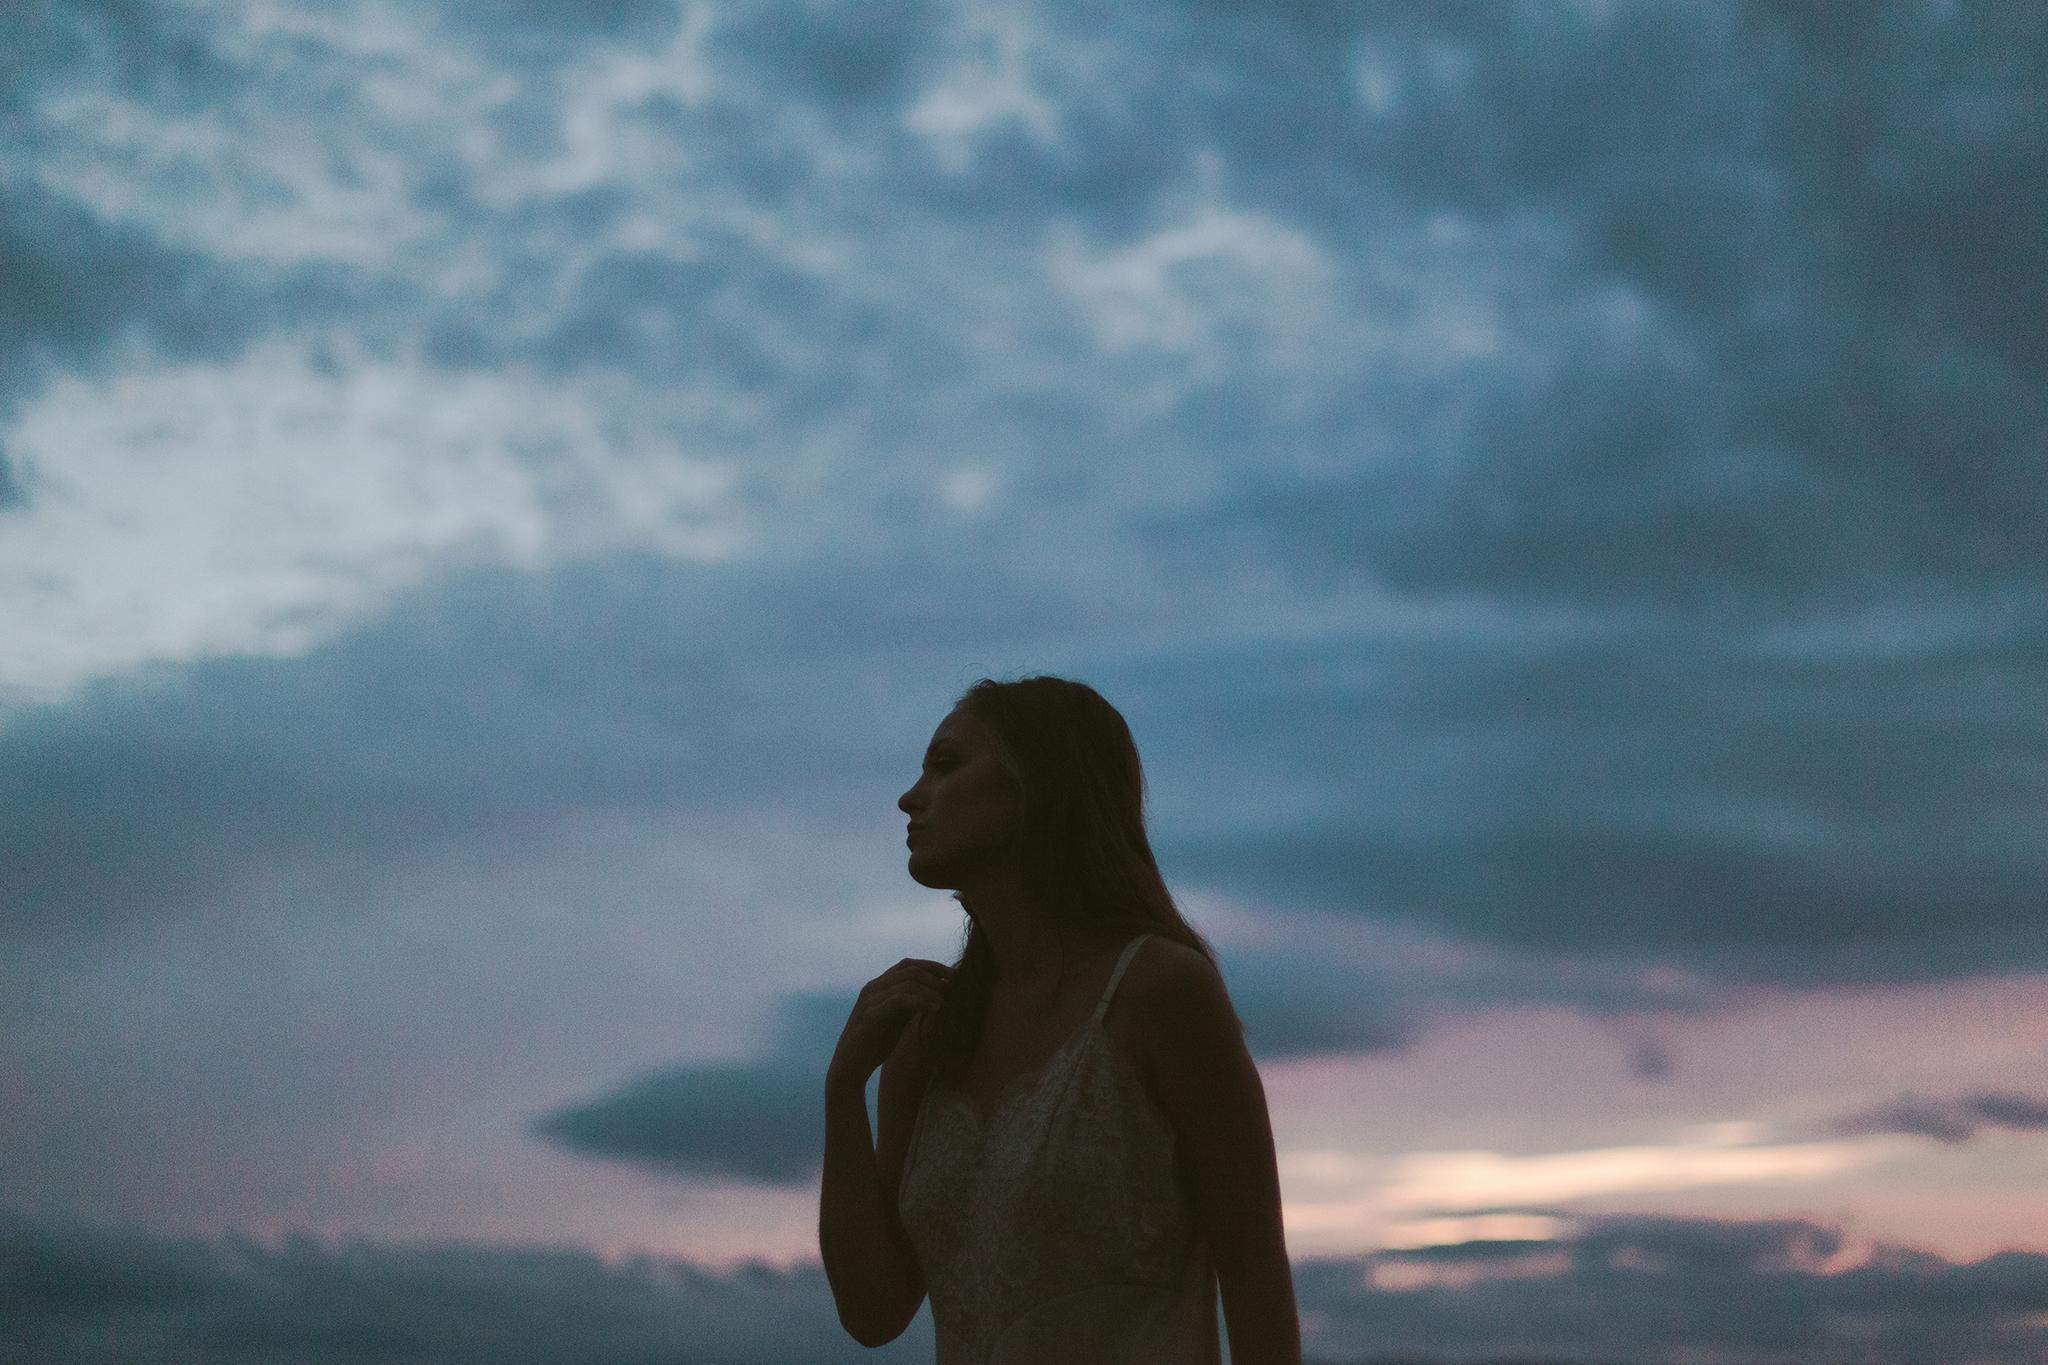 burlington_vermont_photographer_sunset_beach016.JPG